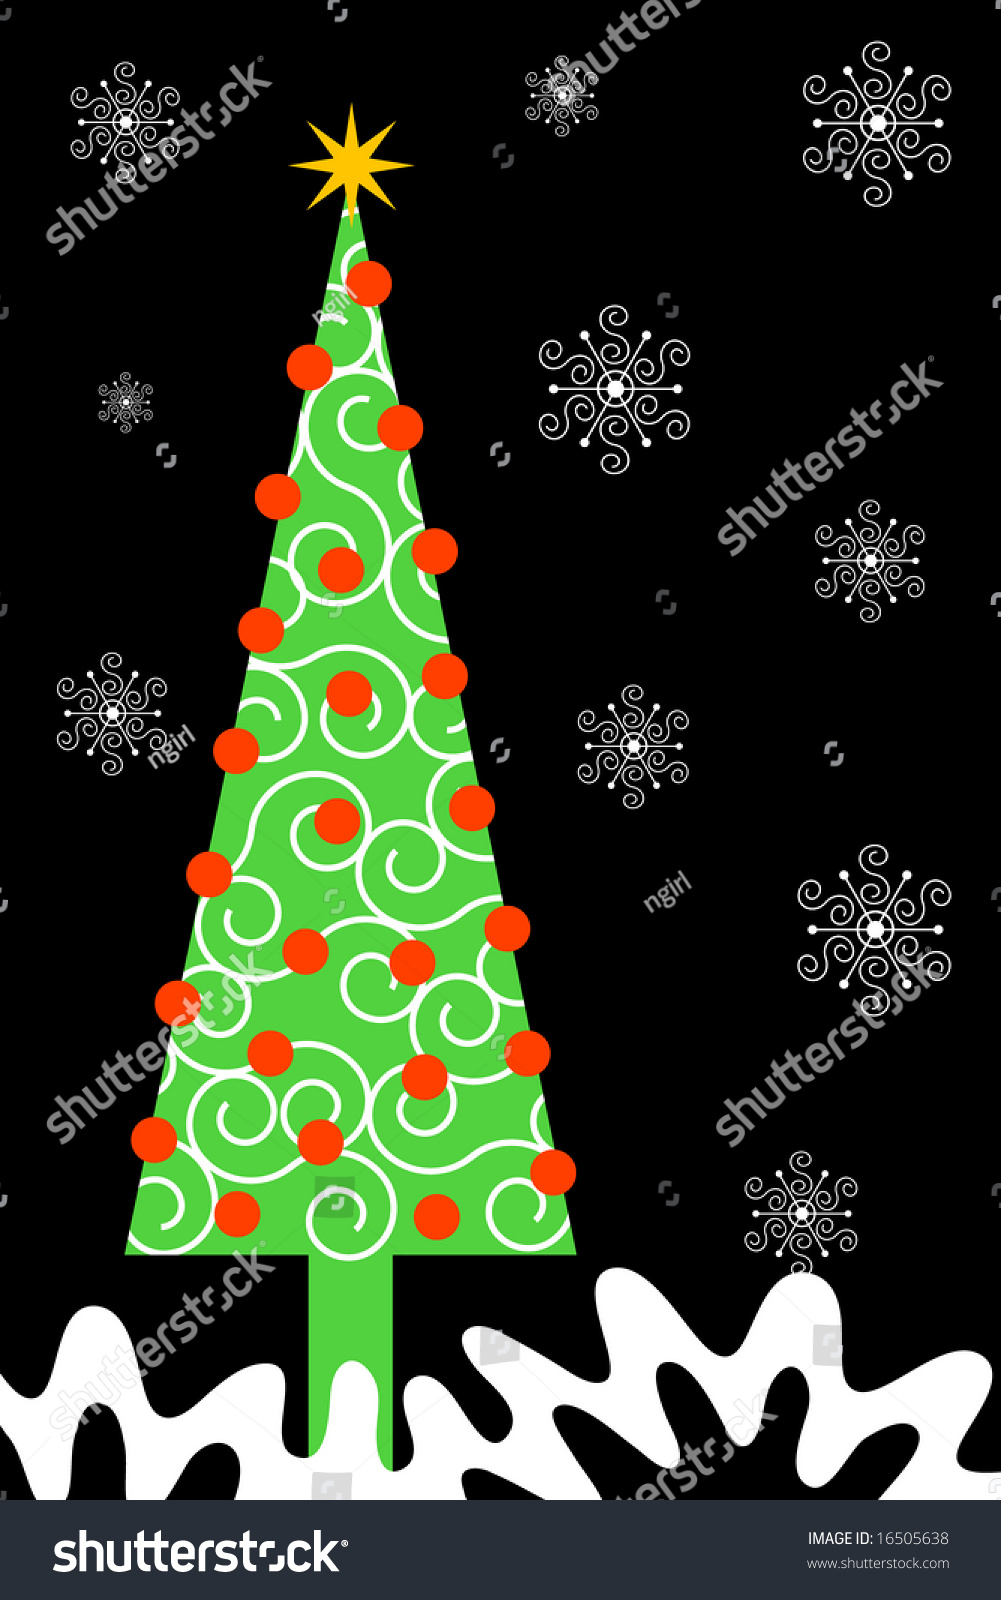 Tall Narrow Christmas Tree Has Red Stock Vector 16505638 - Shutterstock